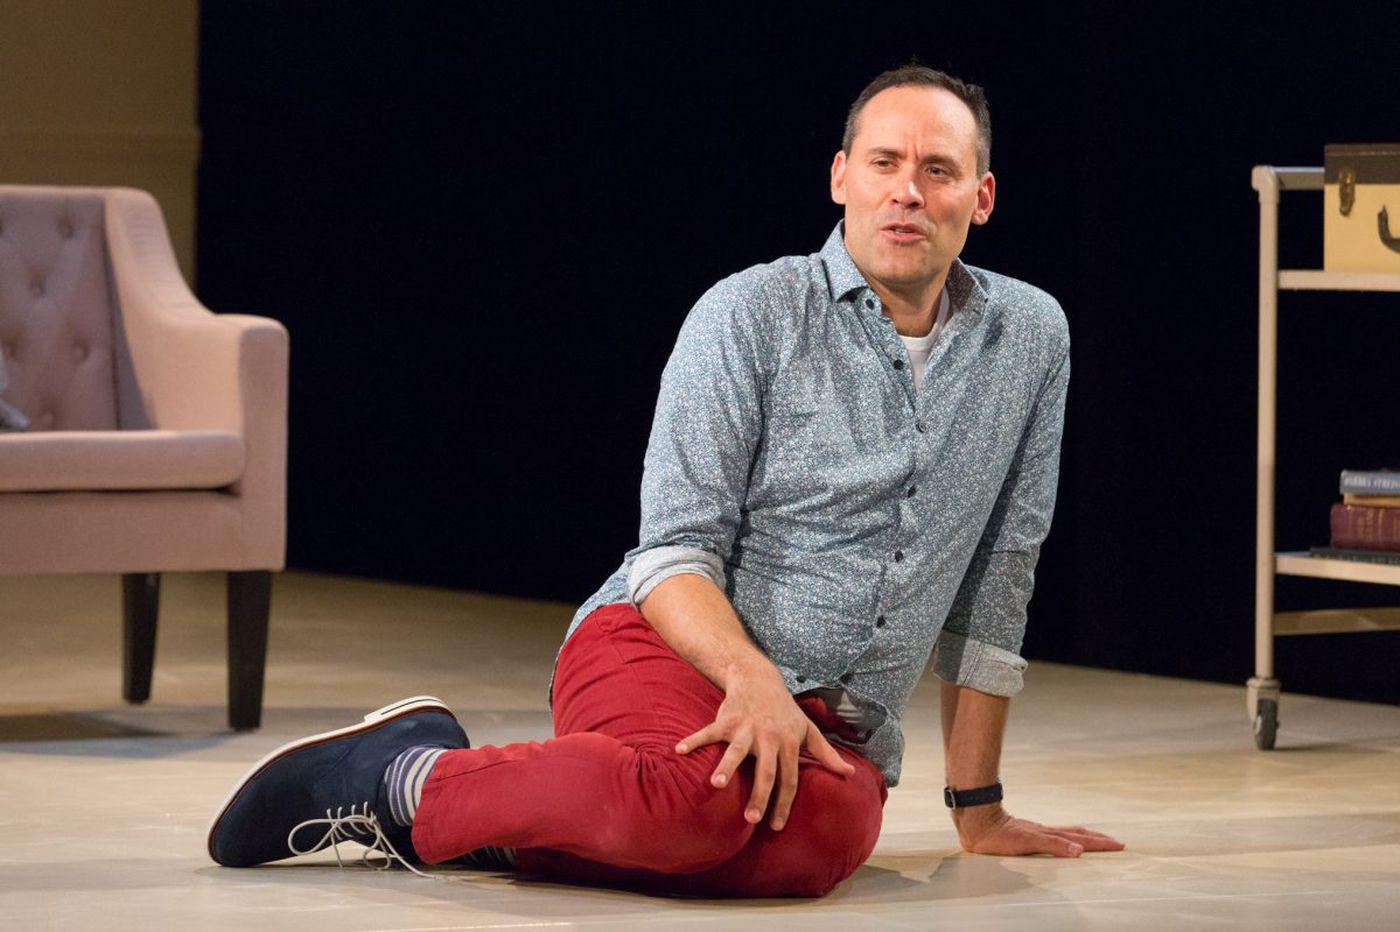 From Martha Graham Cracker to Barbra Streisand: Dito van Reigersberg is brilliant in celebrity satire 'Buyer & Cellar'